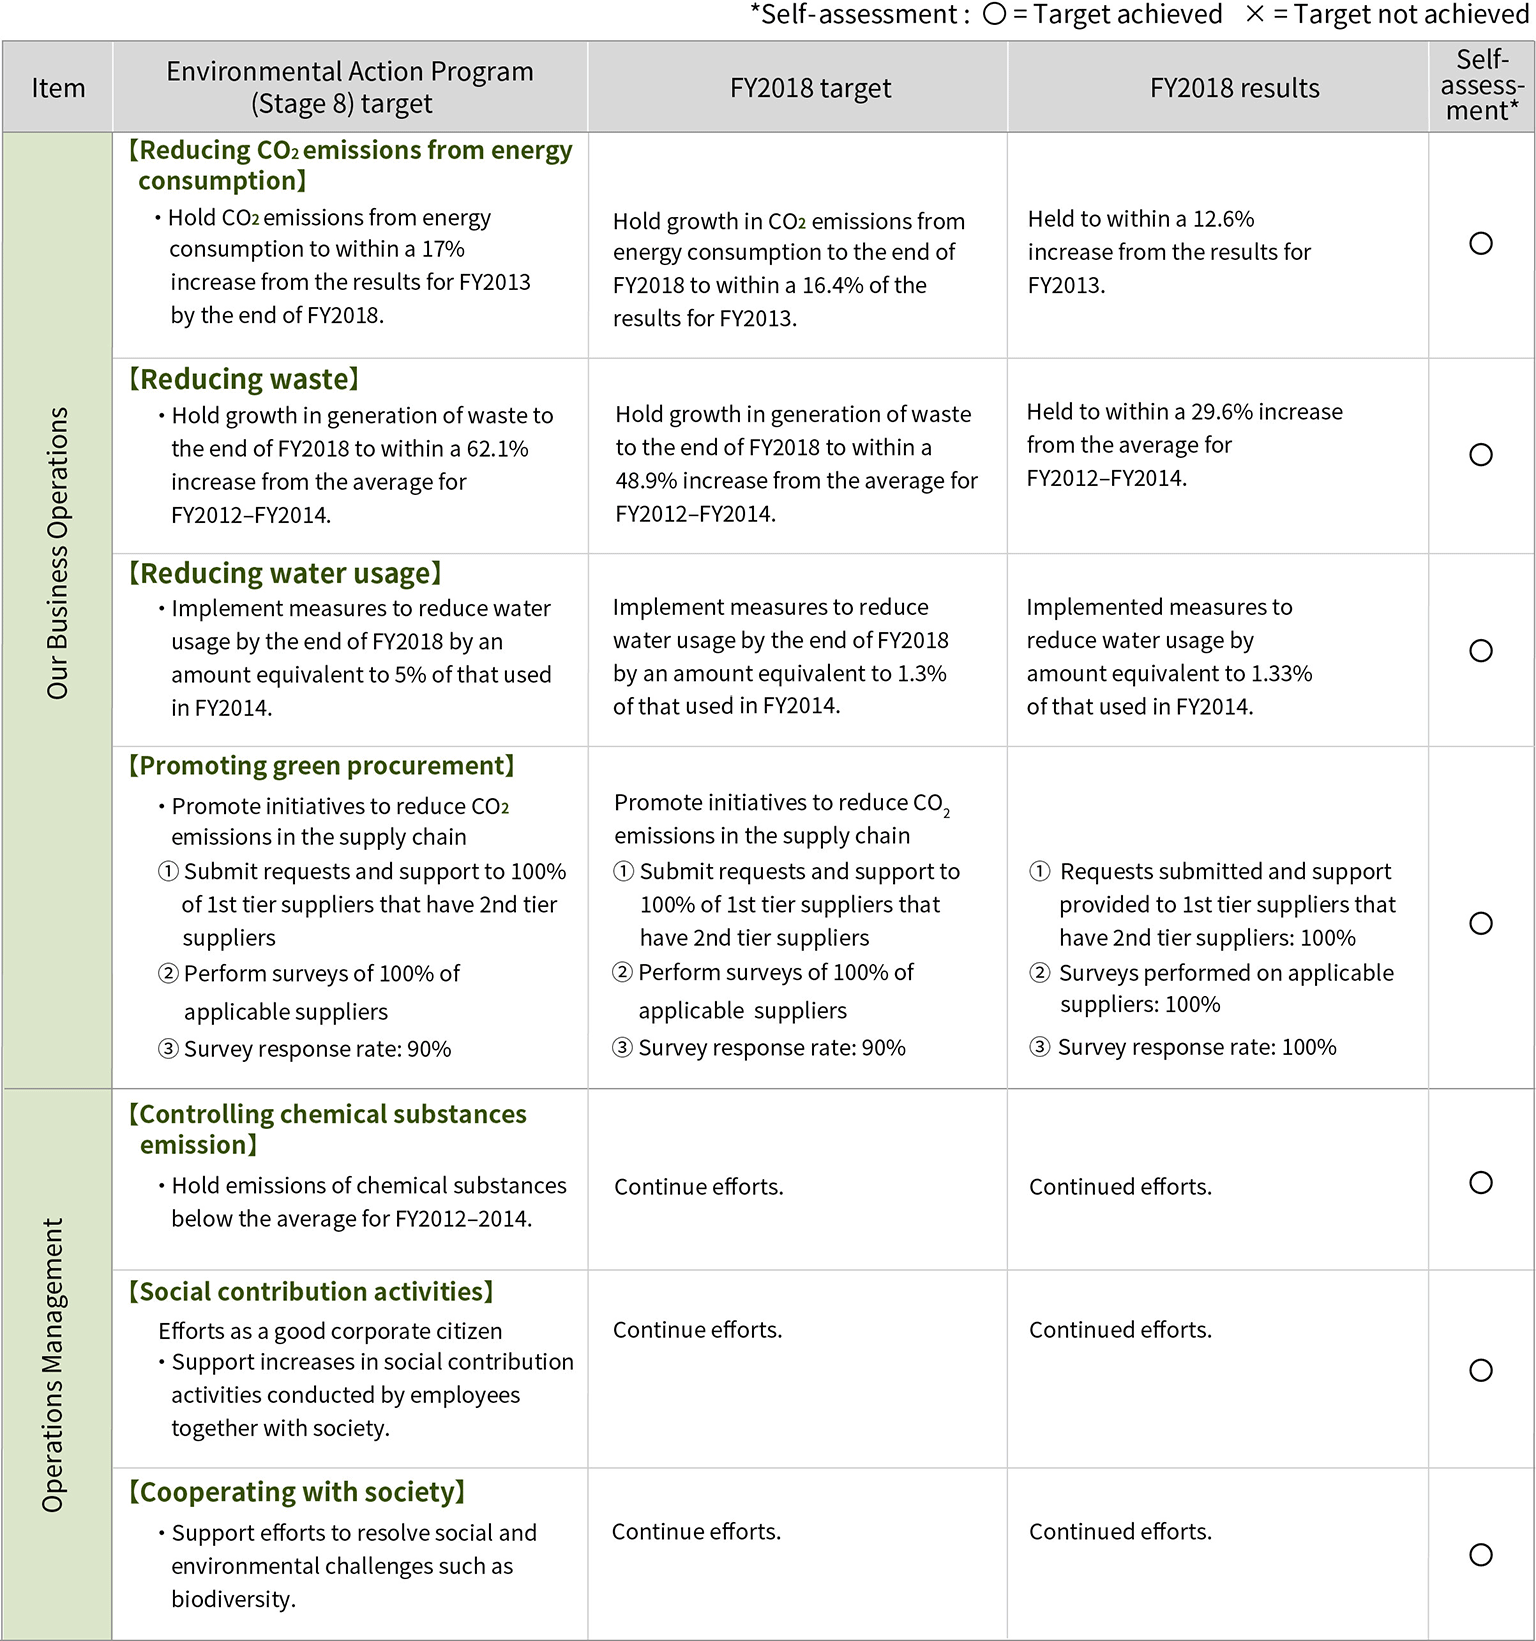 environmental-action-program.png